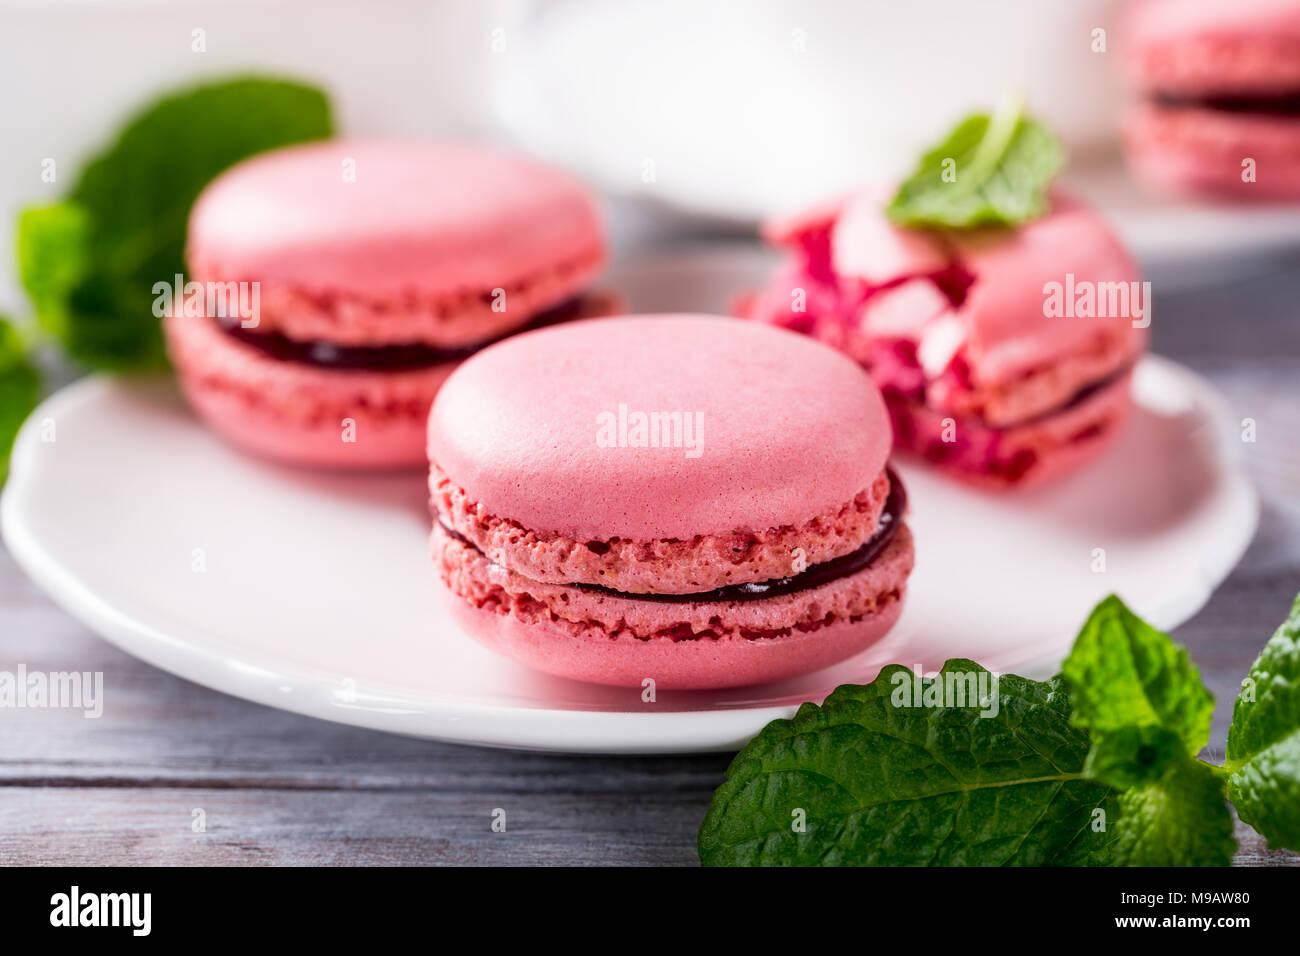 French raspberry macarons - Stock Image